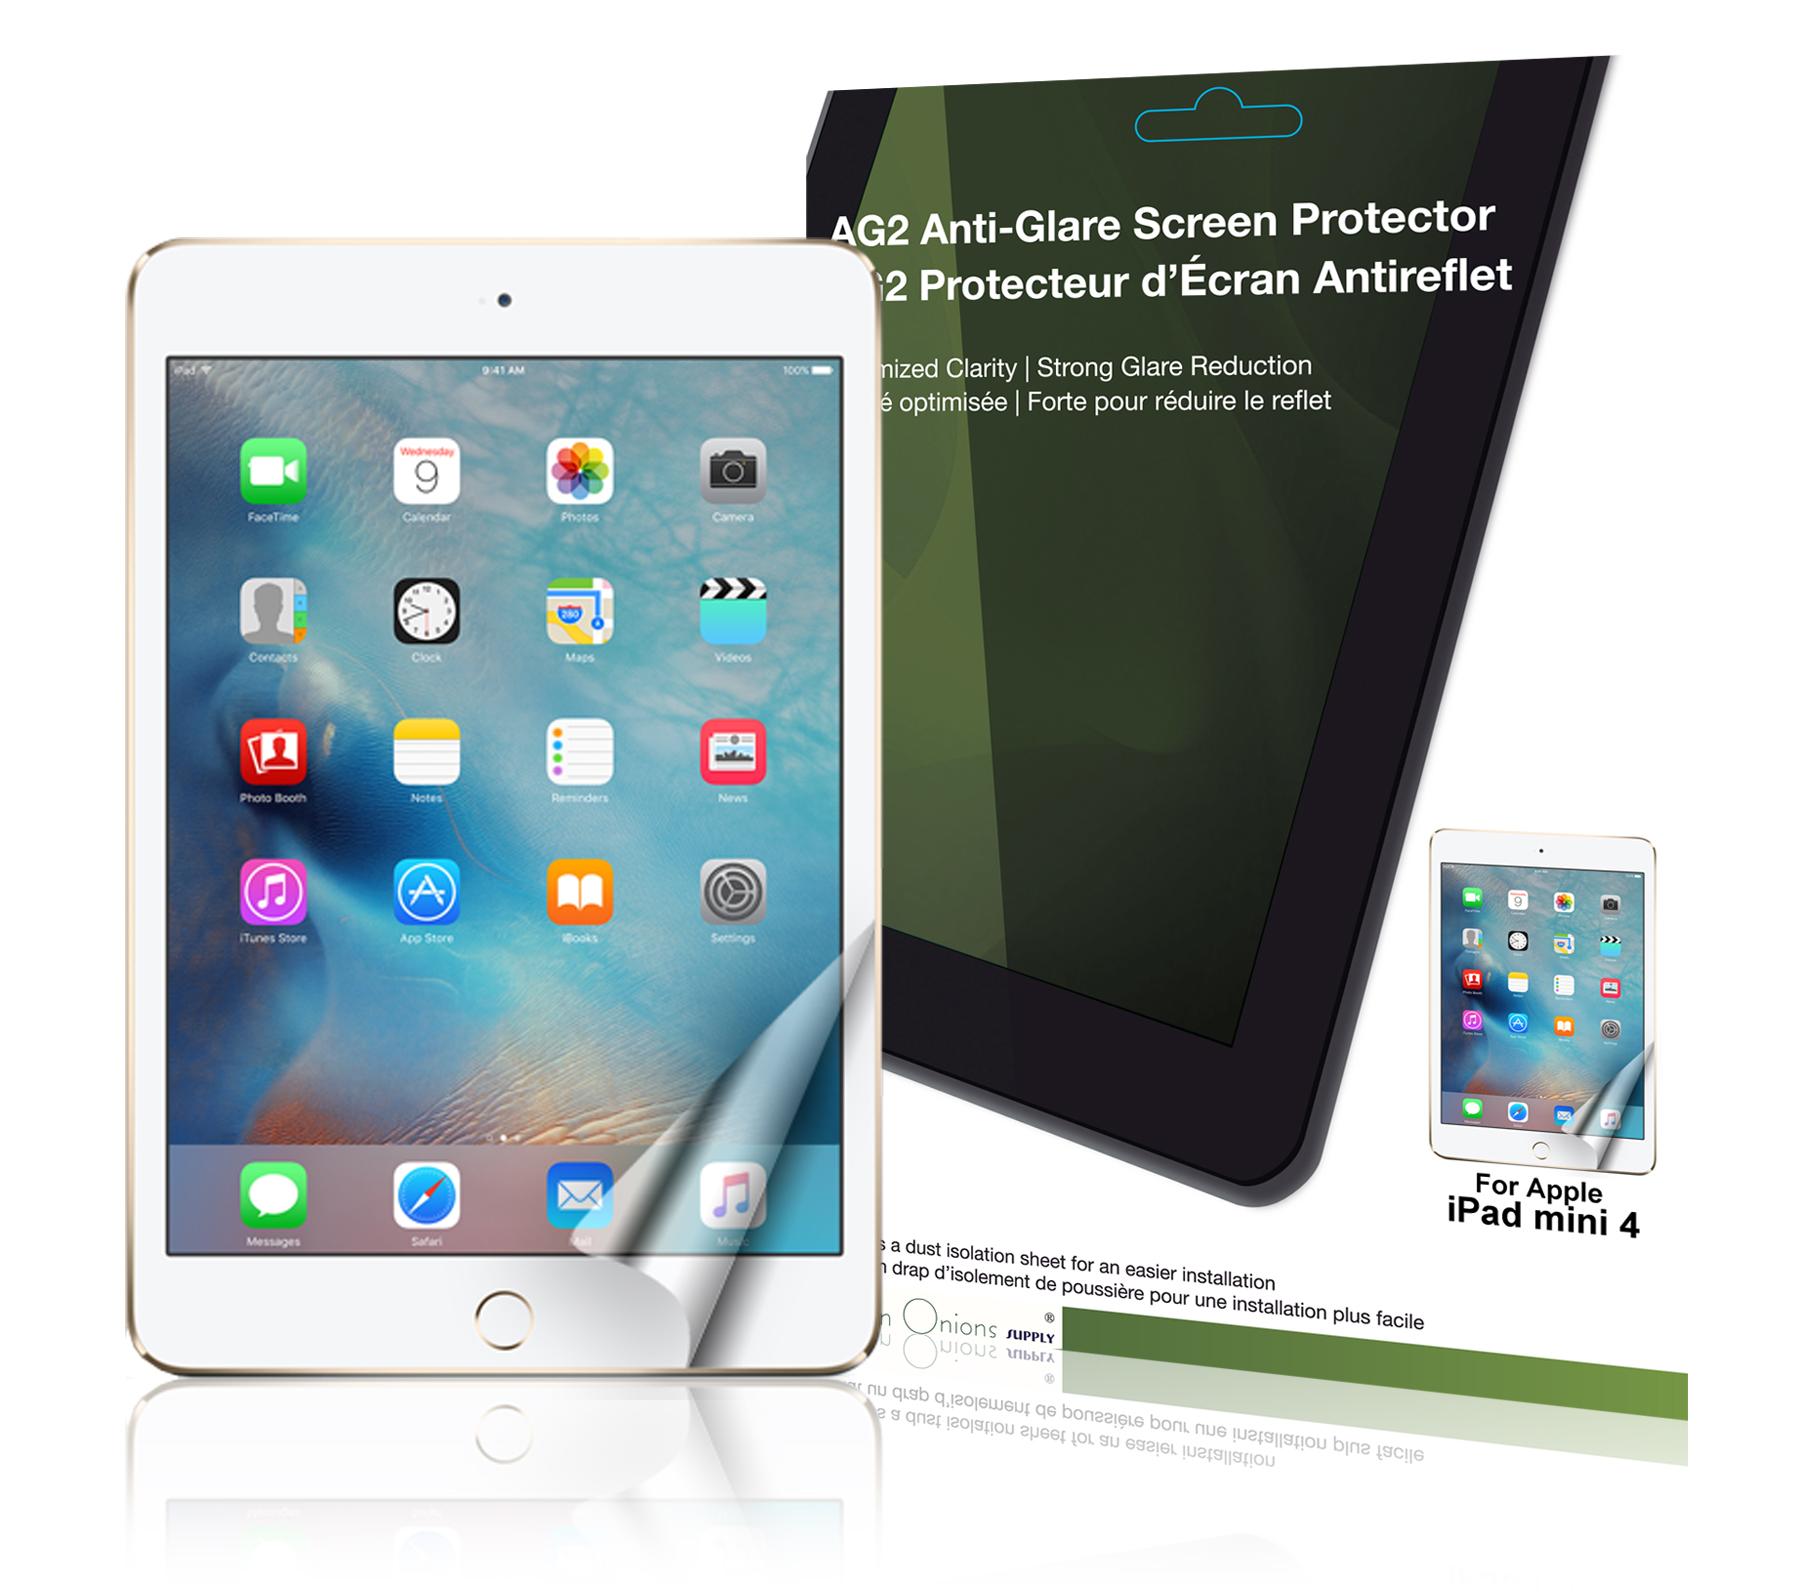 ag2 anti glare screen protector for apple ipad mini 4. Black Bedroom Furniture Sets. Home Design Ideas